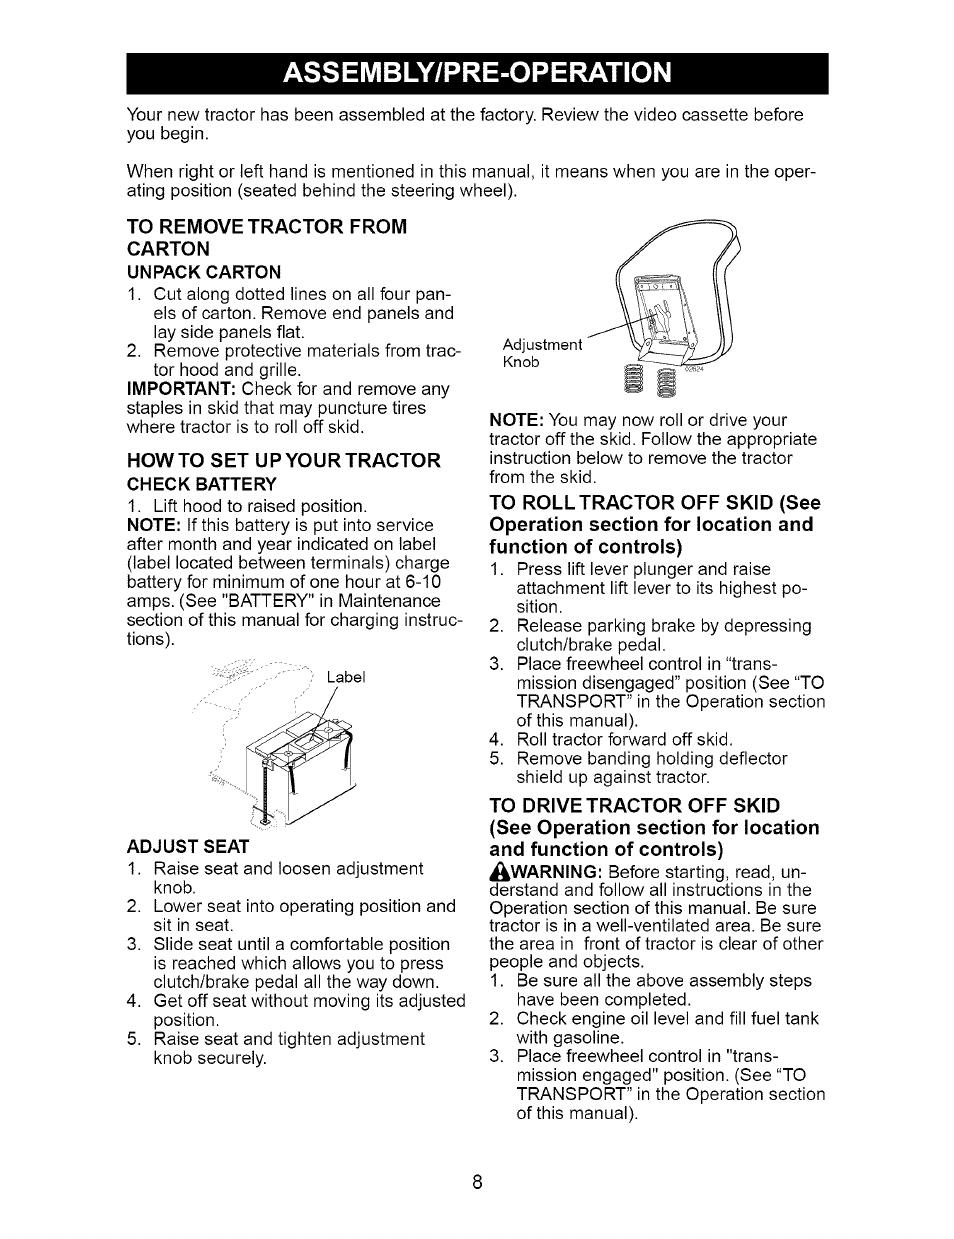 Craftsman Dyt 4000 Manual : Assembly pre operation unpack carton adjust seat